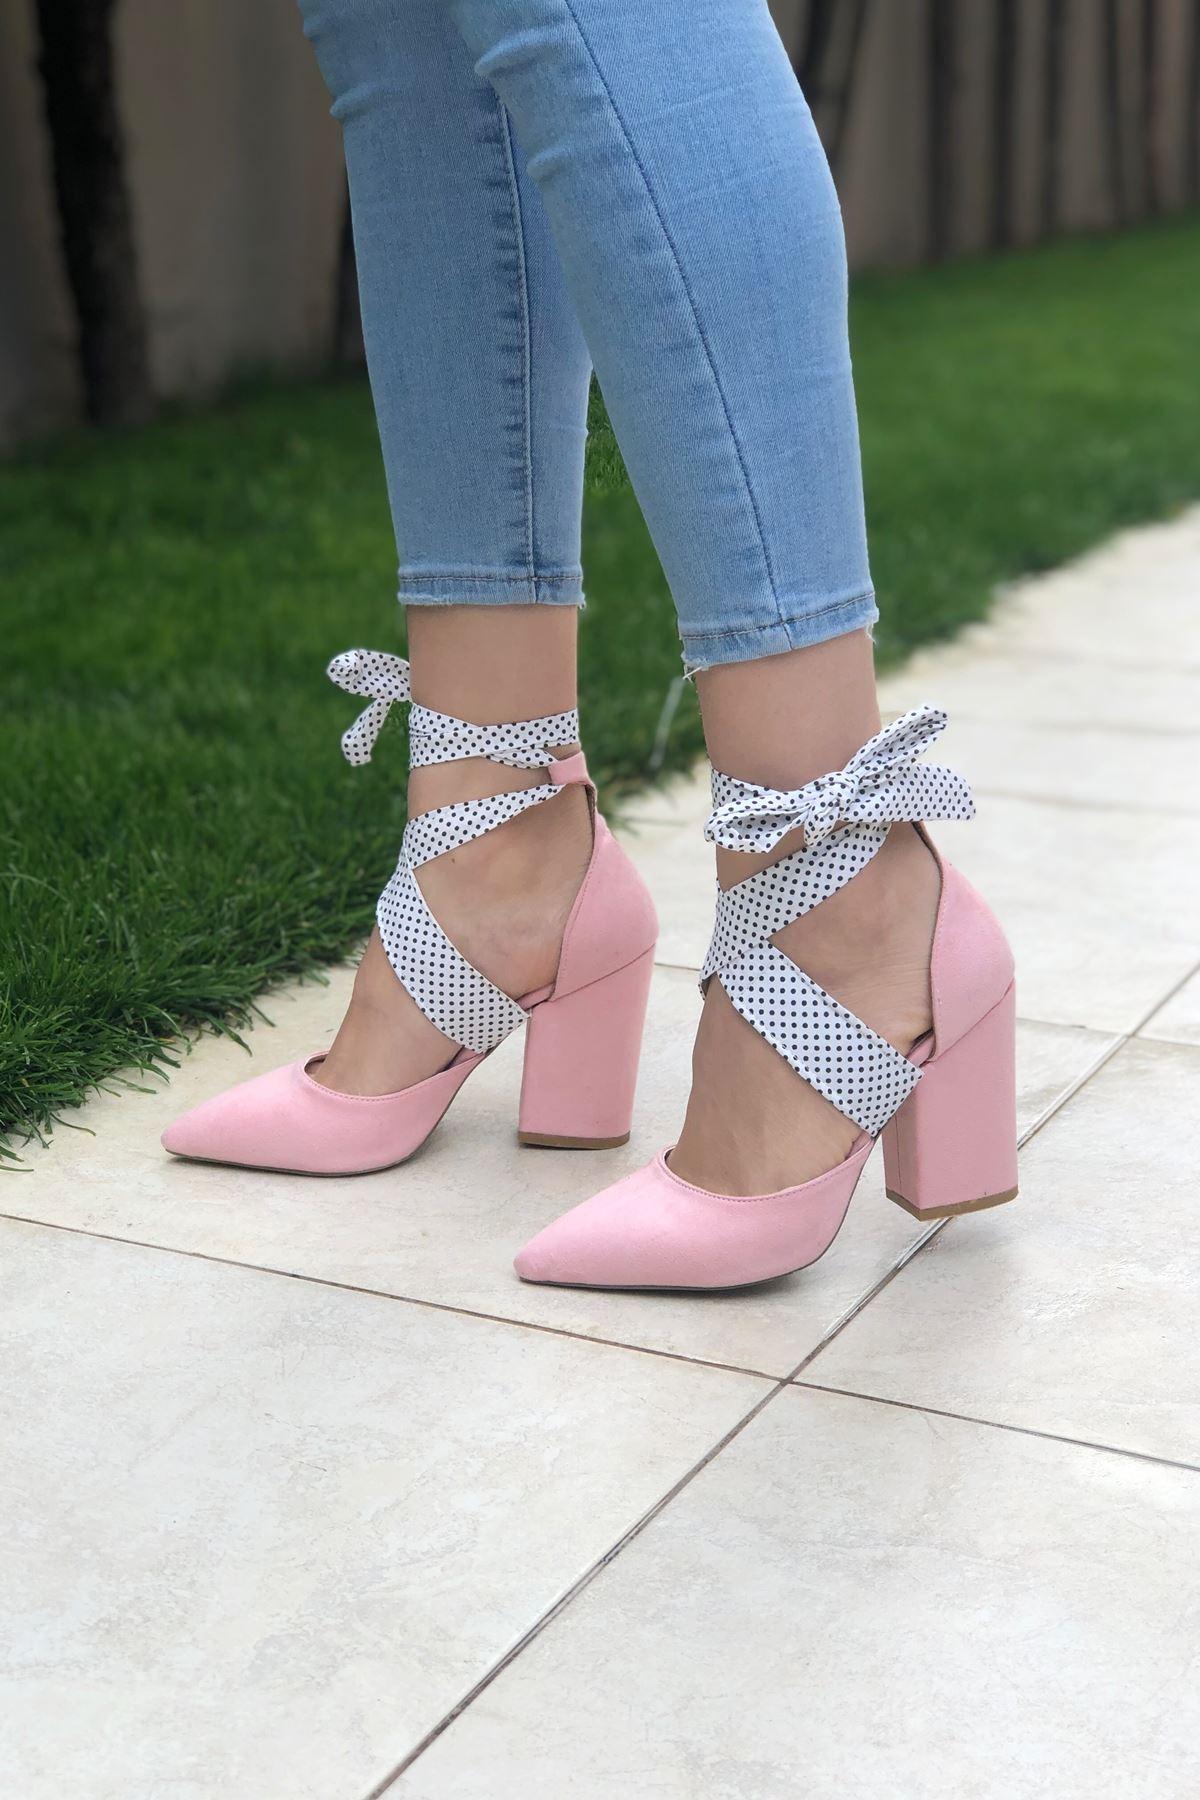 Pembe Süet Topuklu Ayakkabı